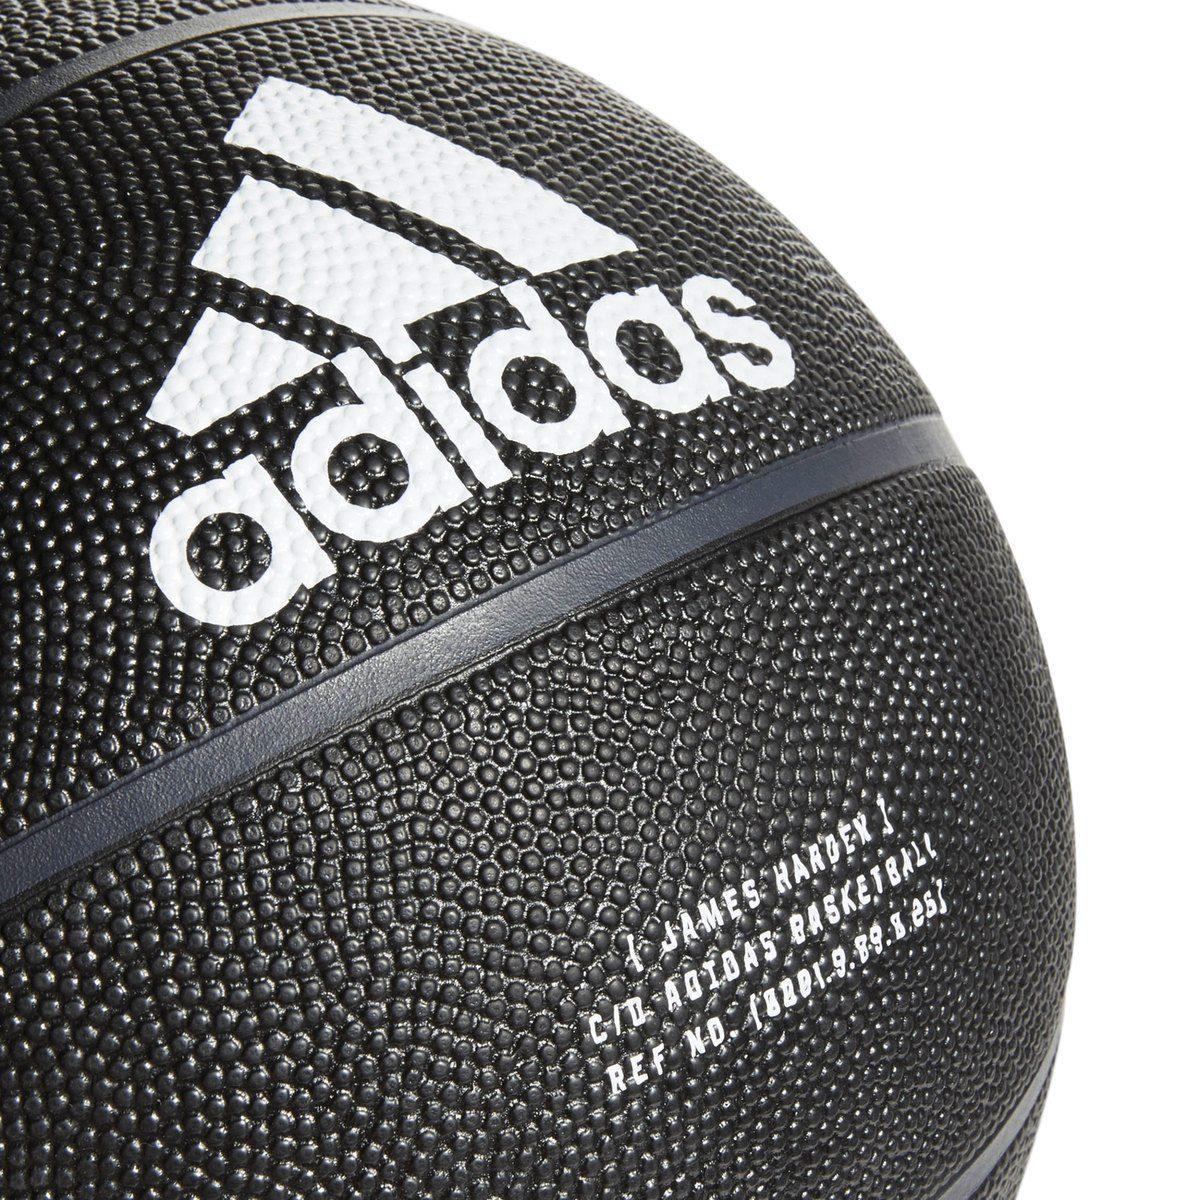 Pelota Harden Sig adidas Sport 78 Tienda Oficial -   1.499 3c3b7204a023a